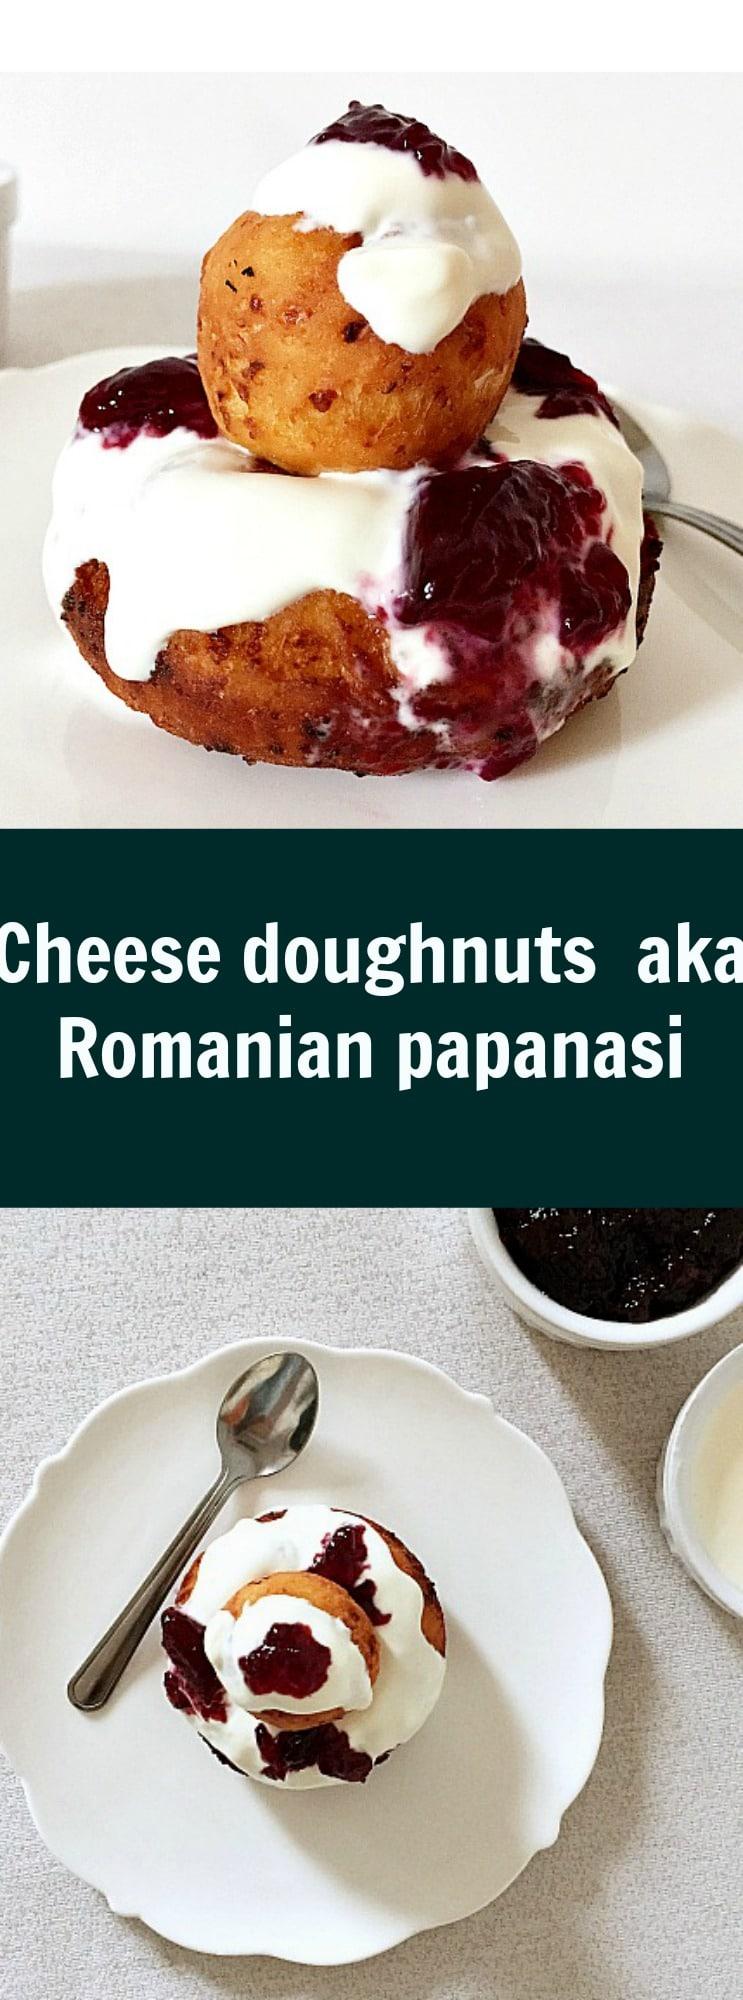 Cheese doughnuts aka Romanian papanasi